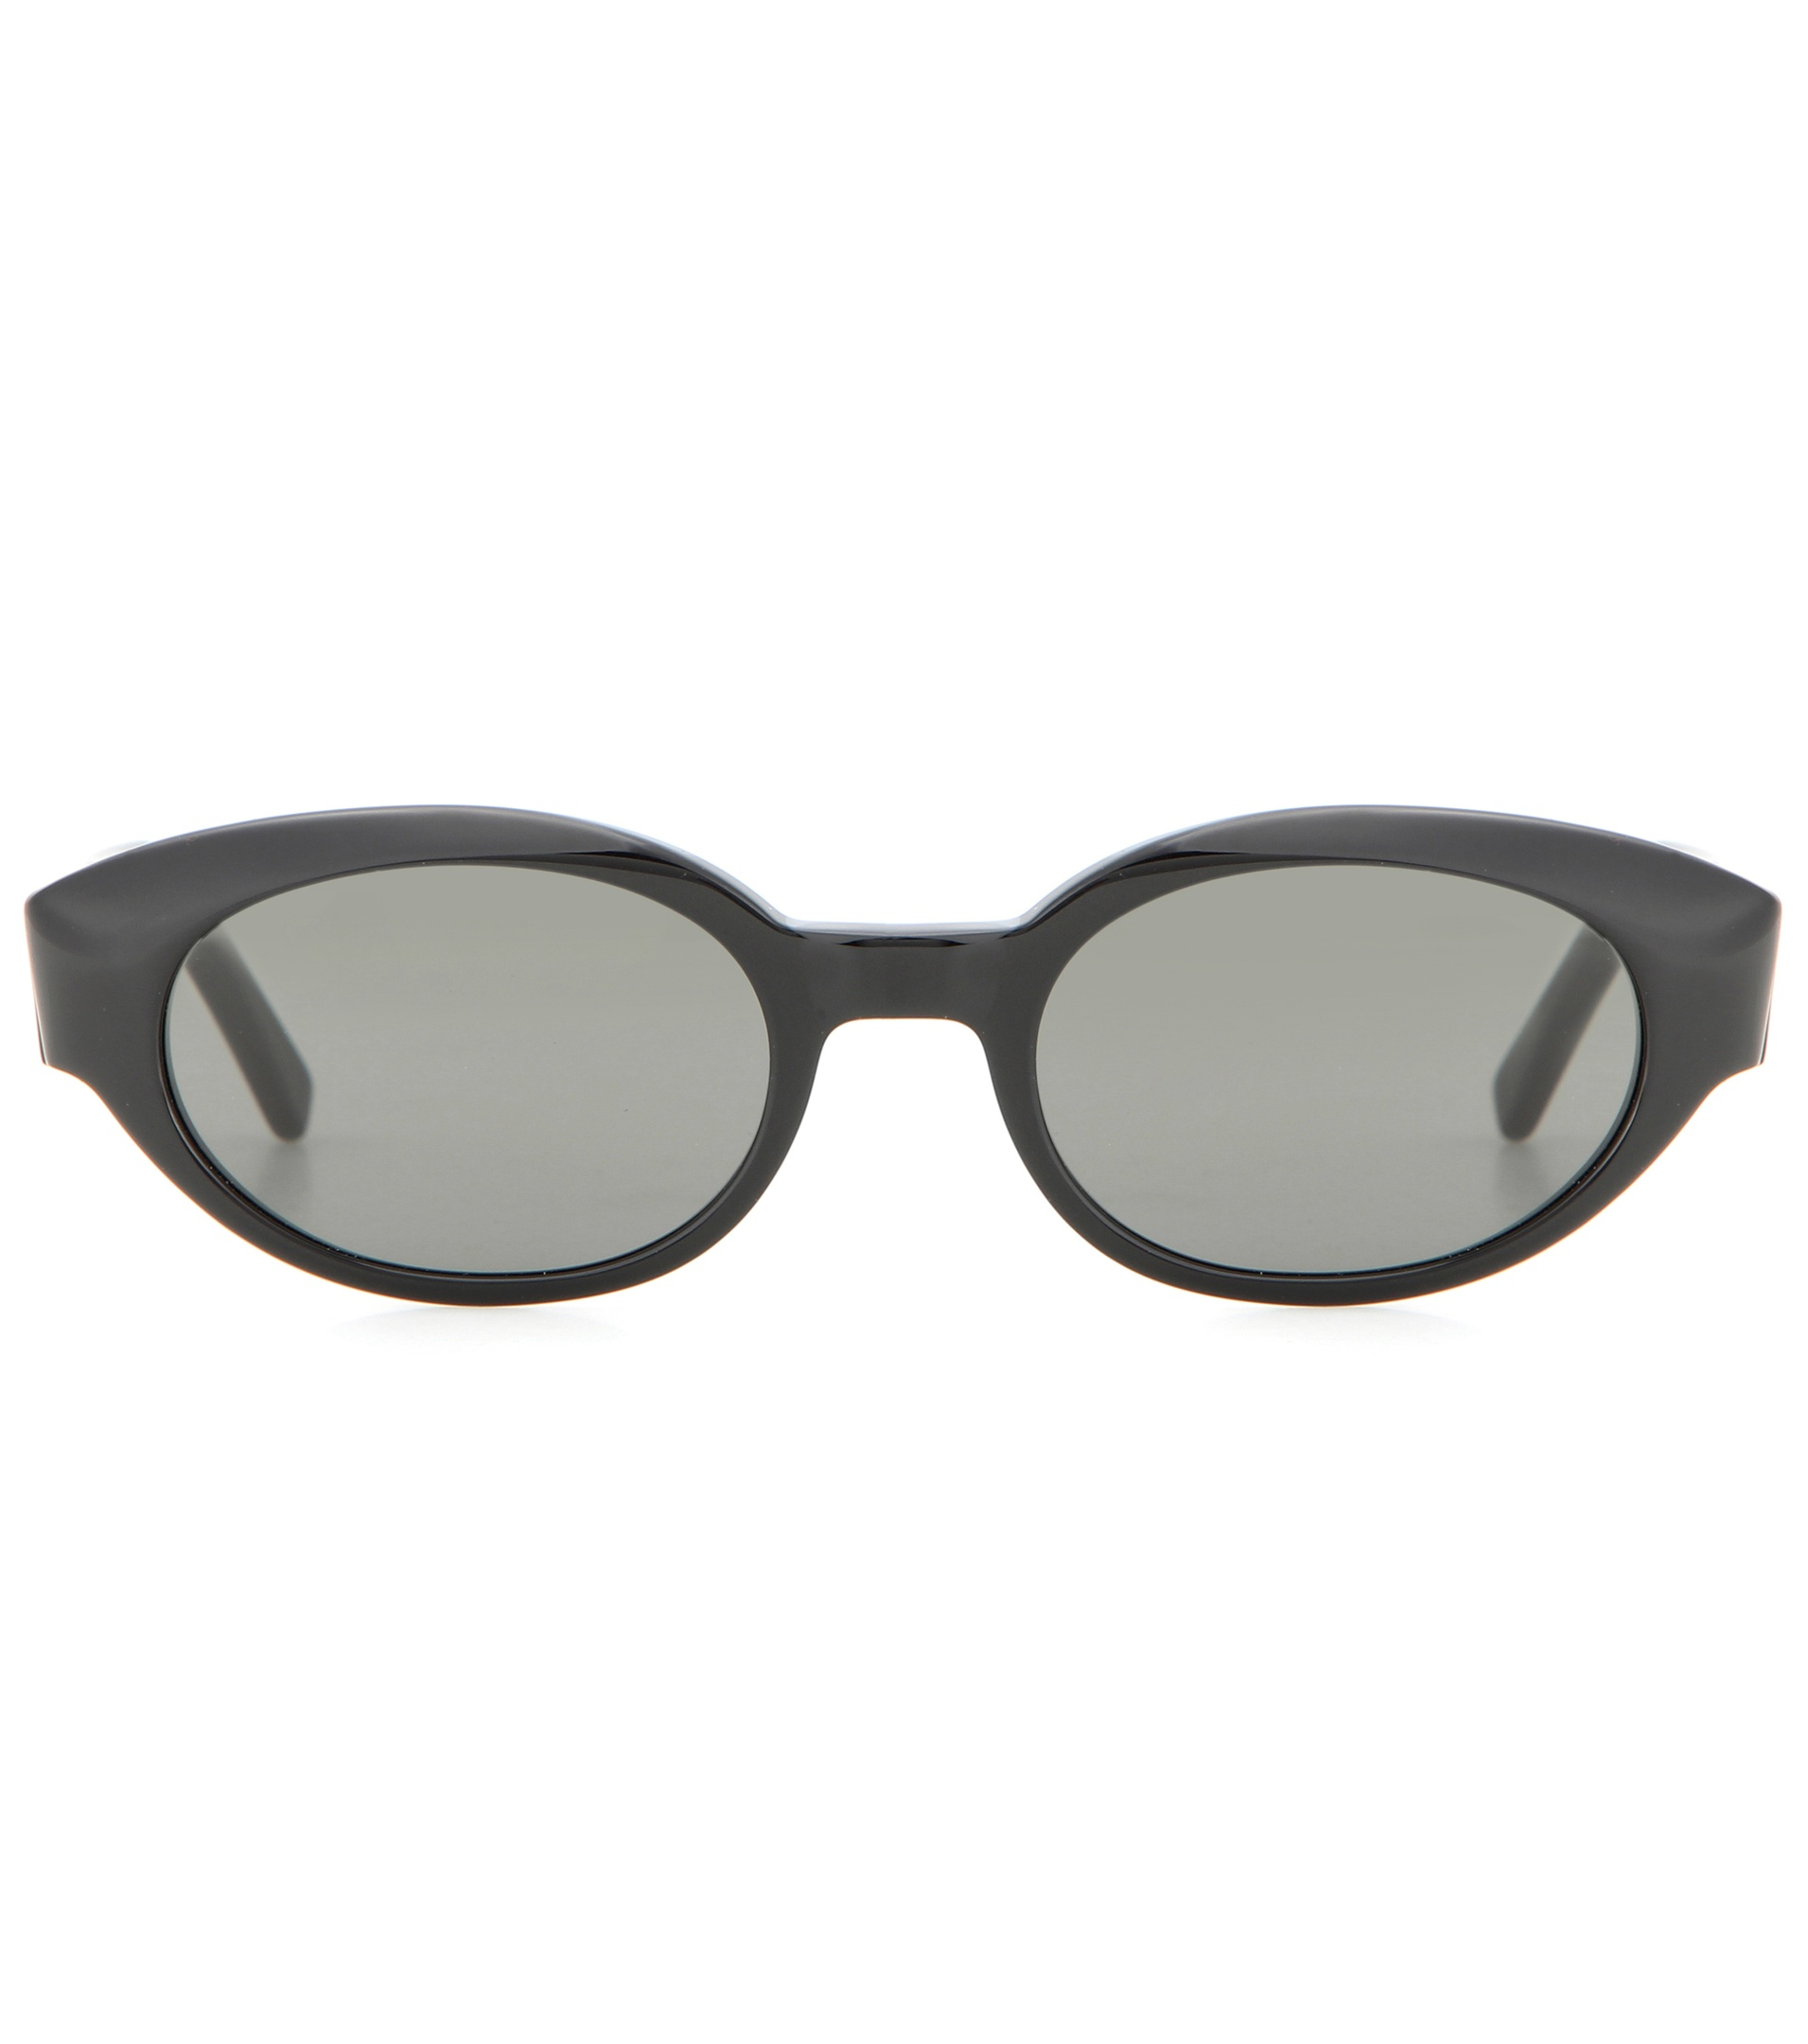 ab35396d49d Saint Laurent Lola Sunglasses in Black - Lyst